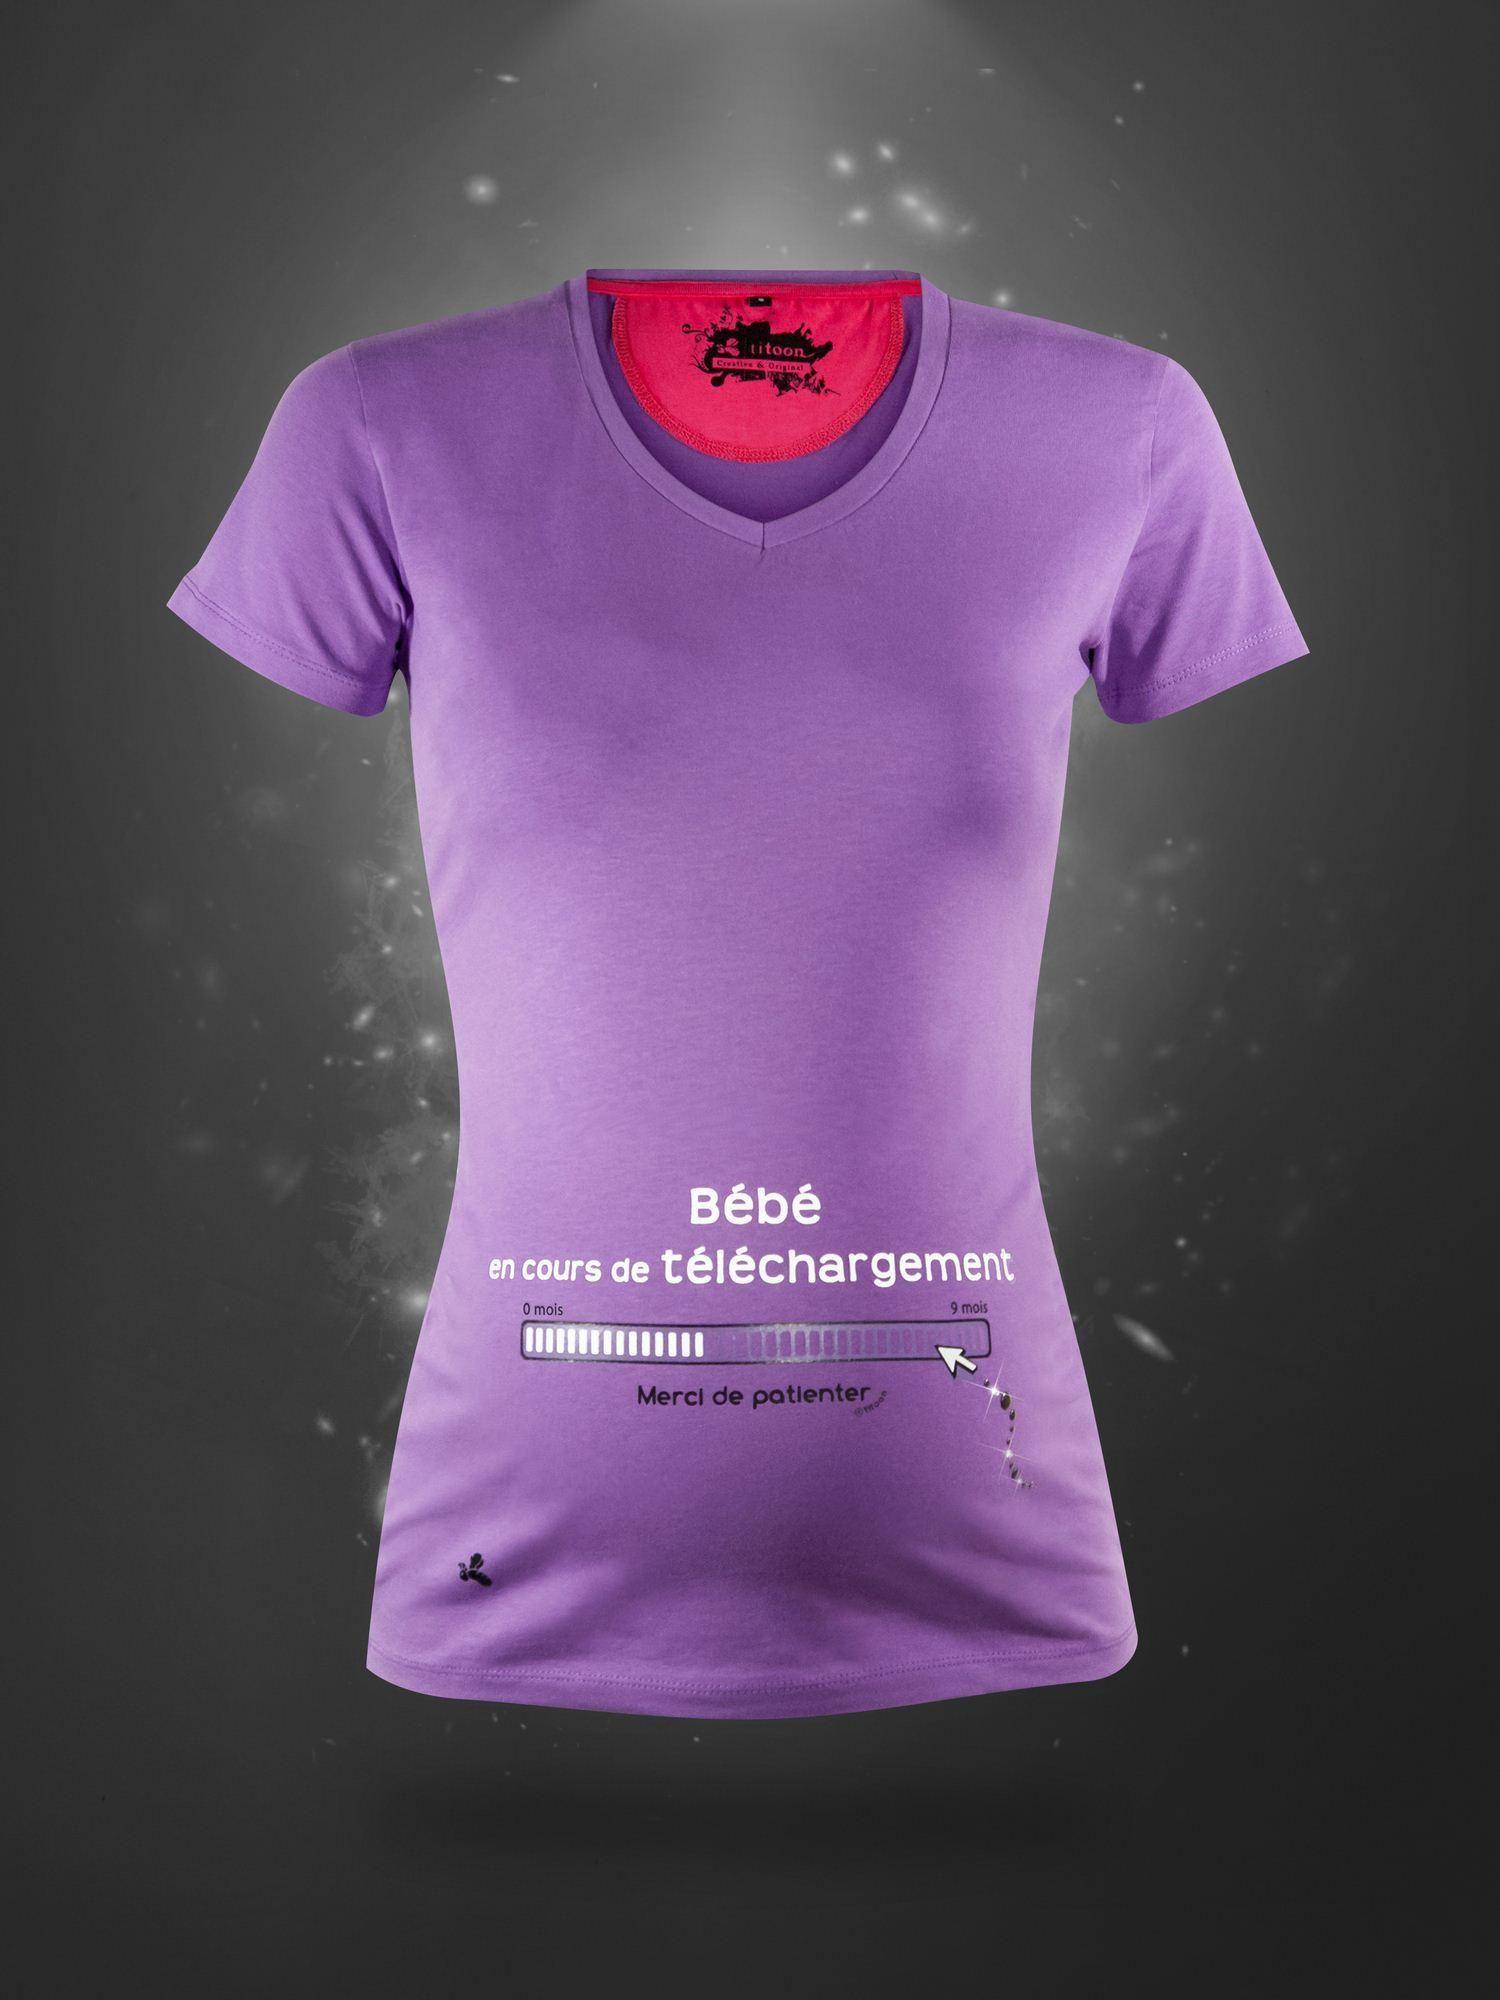 f95362f7010 Tee shirt grossesse - Bébé en téléchargement